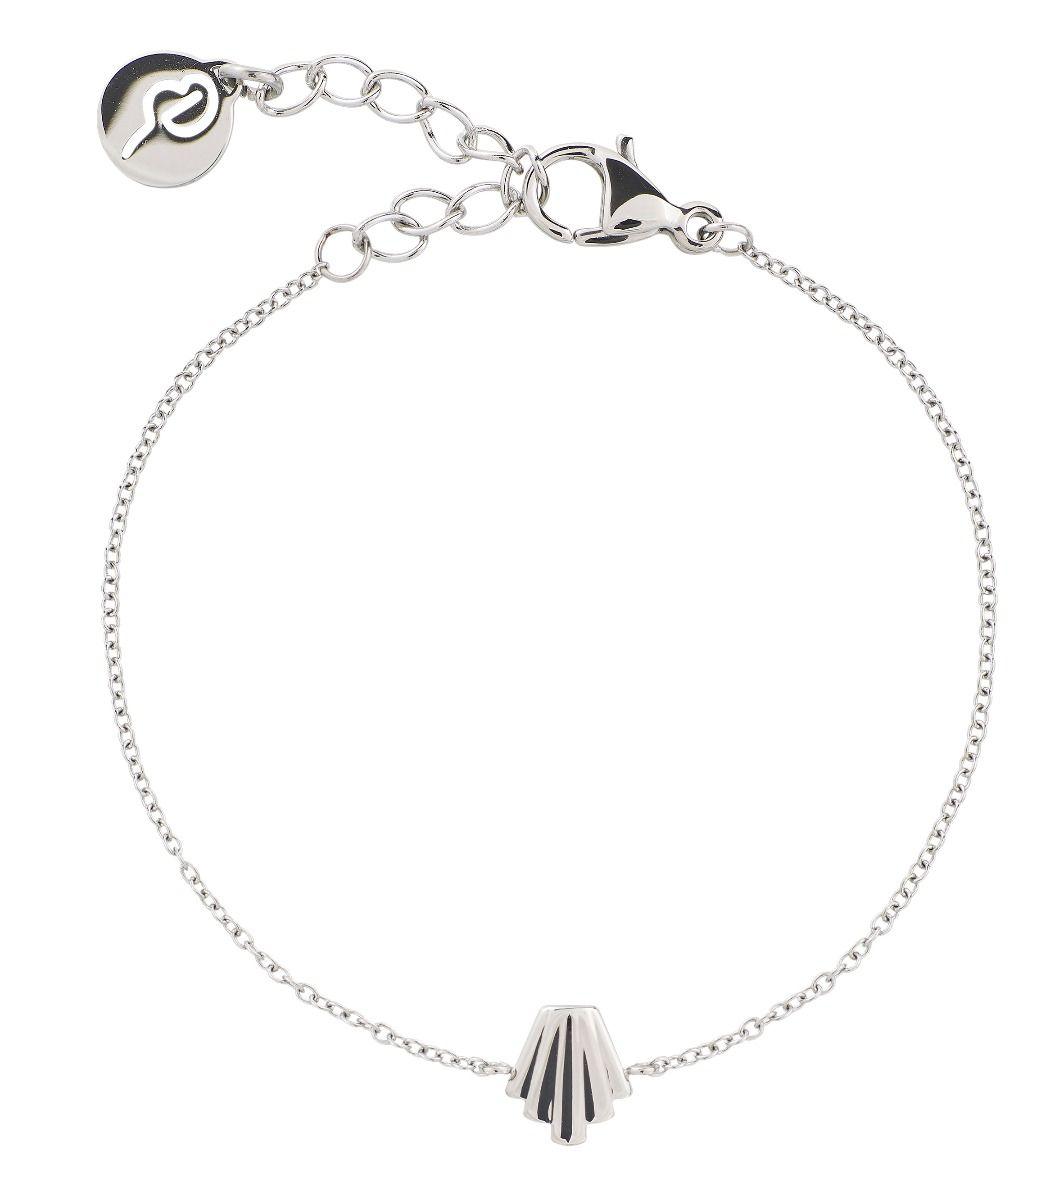 : - Michelle armband stål